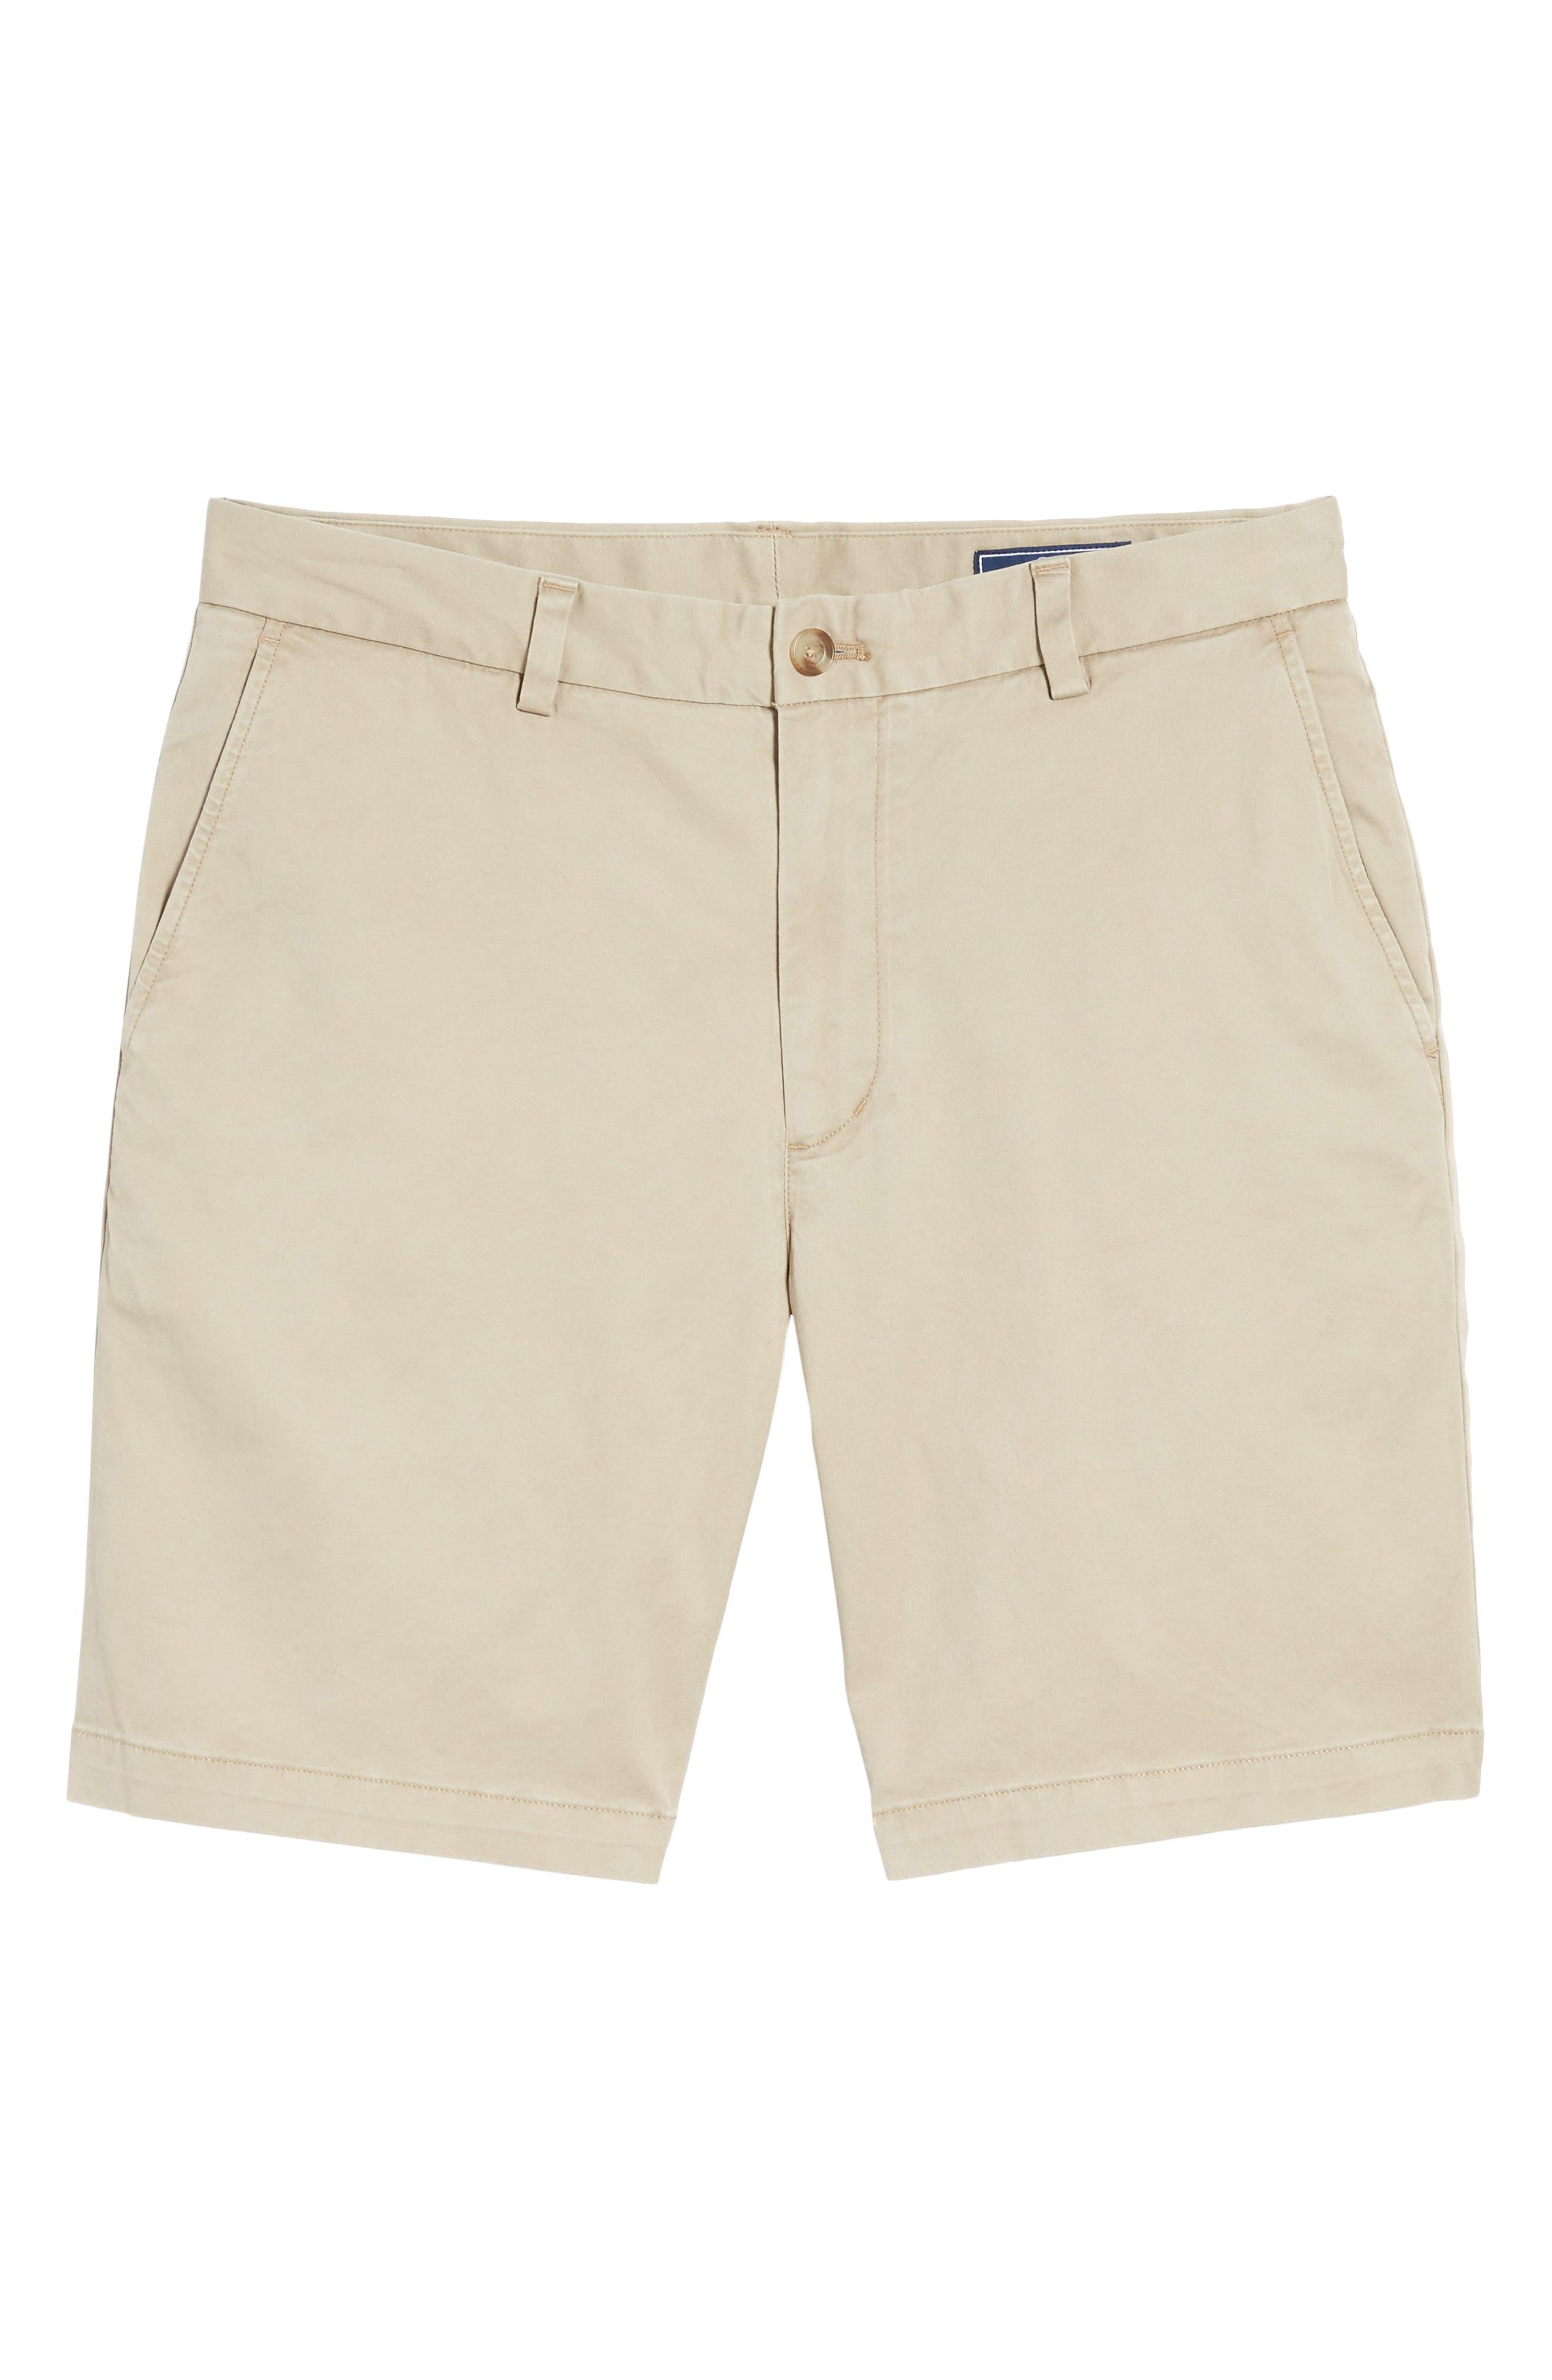 9 Inch Stretch Breaker Shorts,                             Alternate thumbnail 124, color,